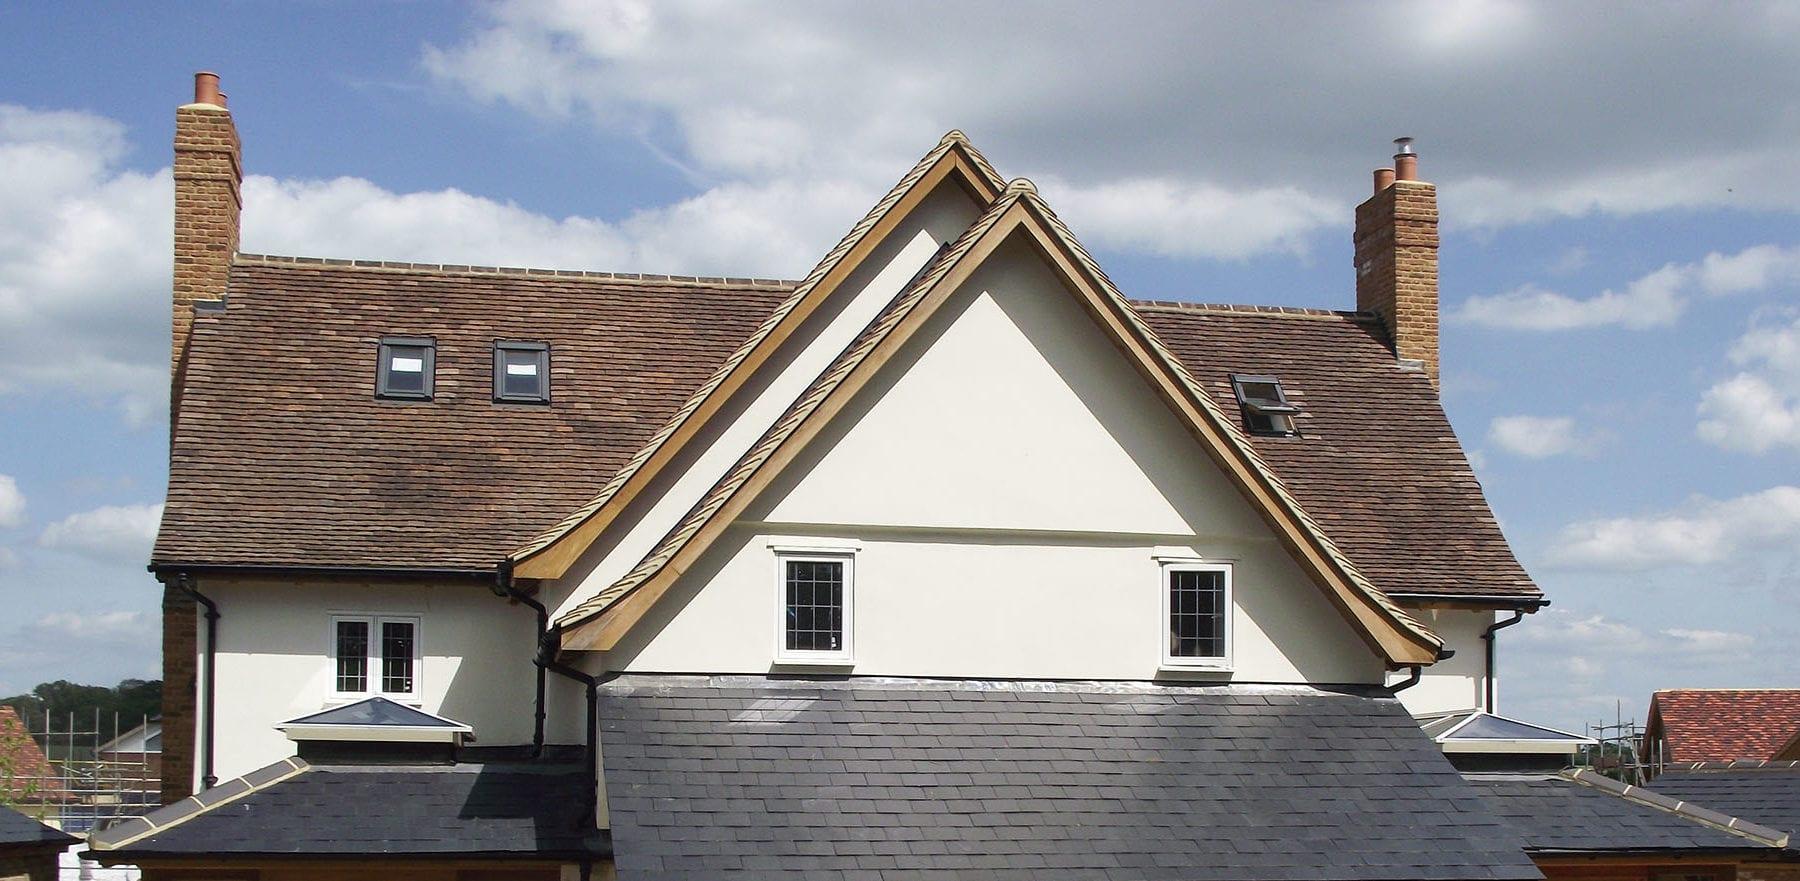 Lifestiles - Handmade Restoration Clay Roof Tiles - Manuden, England 4